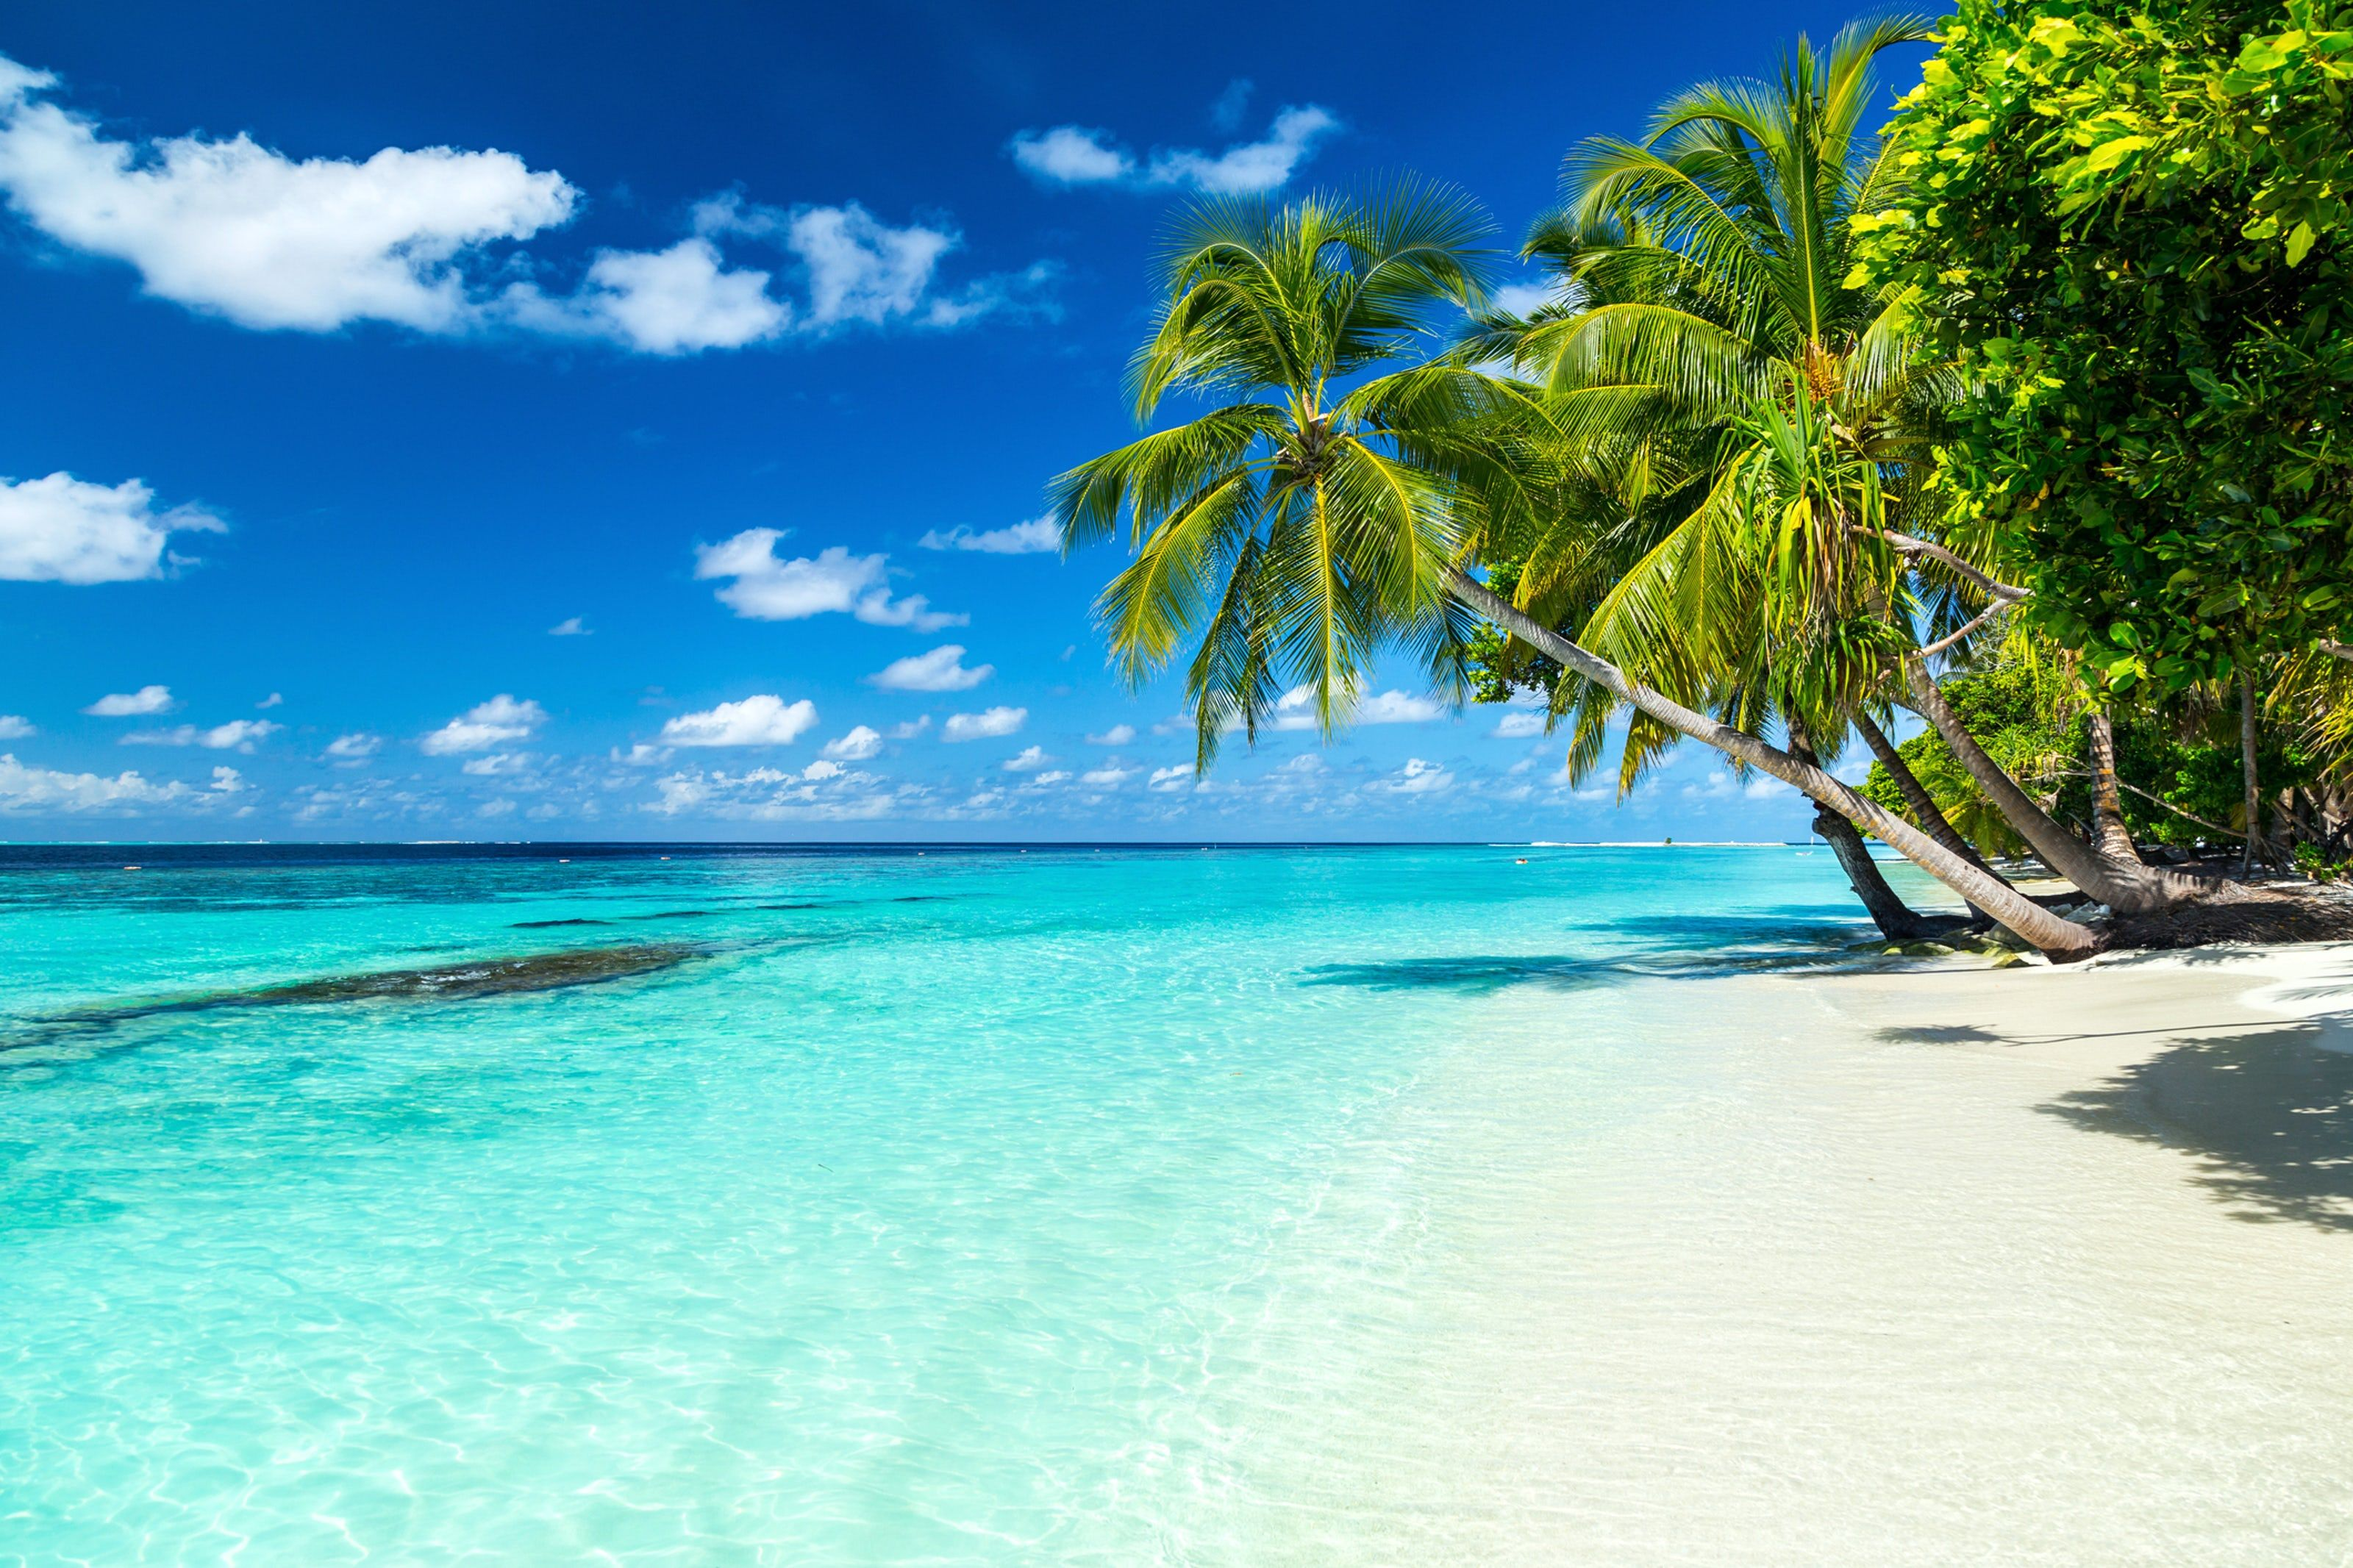 Maldives Stunning Views Above Below The Water Tropical Paradise Beach Beach Paradise Island Vacation